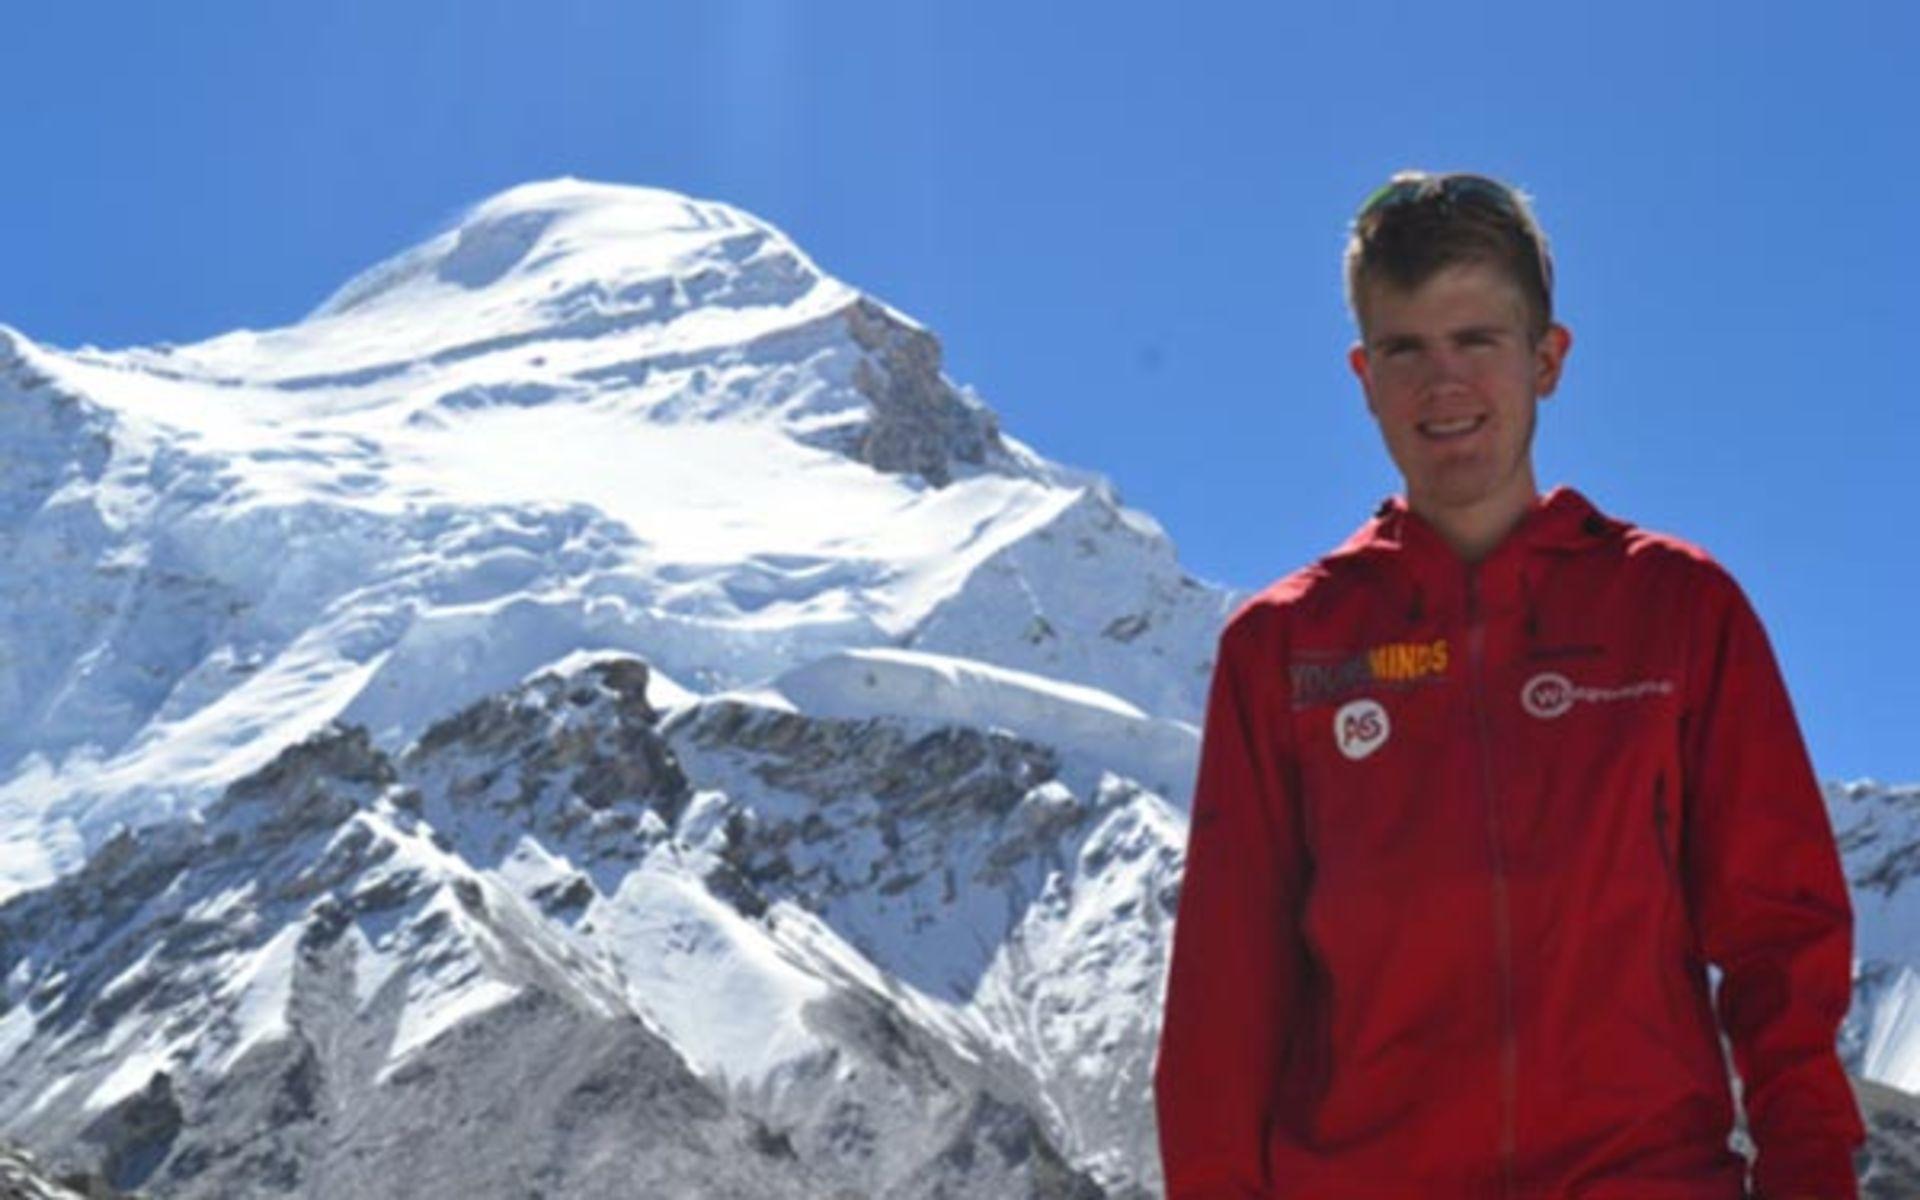 https://etchrock.com/Alex Staniforth - Everesting: Summiting the Saddle